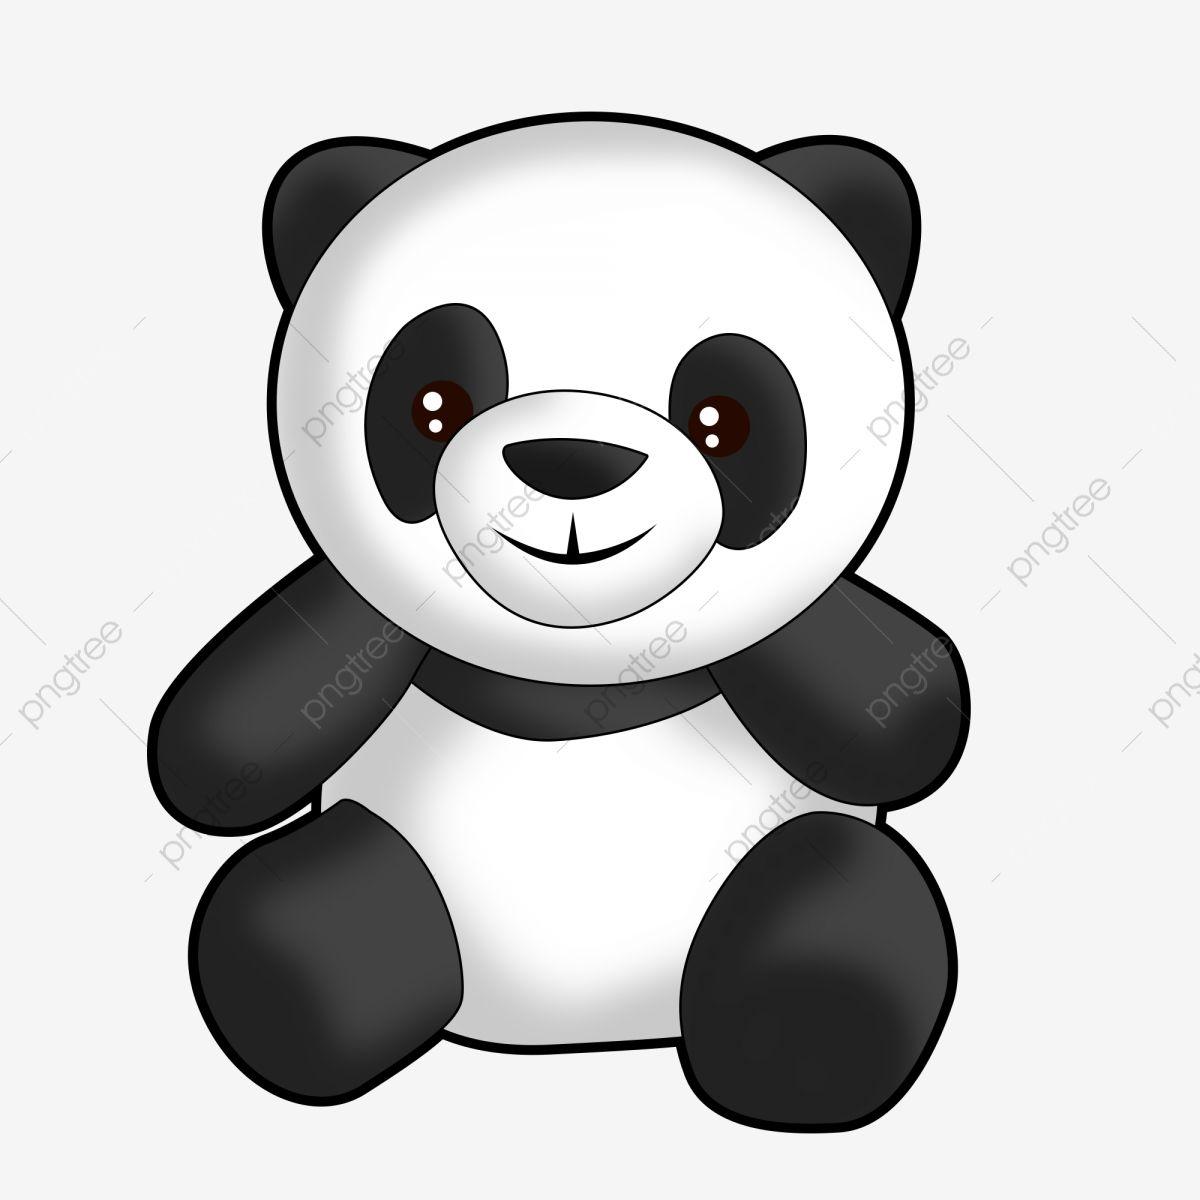 Cartoon Panda Commercial Material Panda Clipart Clipart Panda Cartoon Panda Png Transparent Clipart Image And Psd File For Free Download Work Cartoons Pandas Playing Cartoon Animals